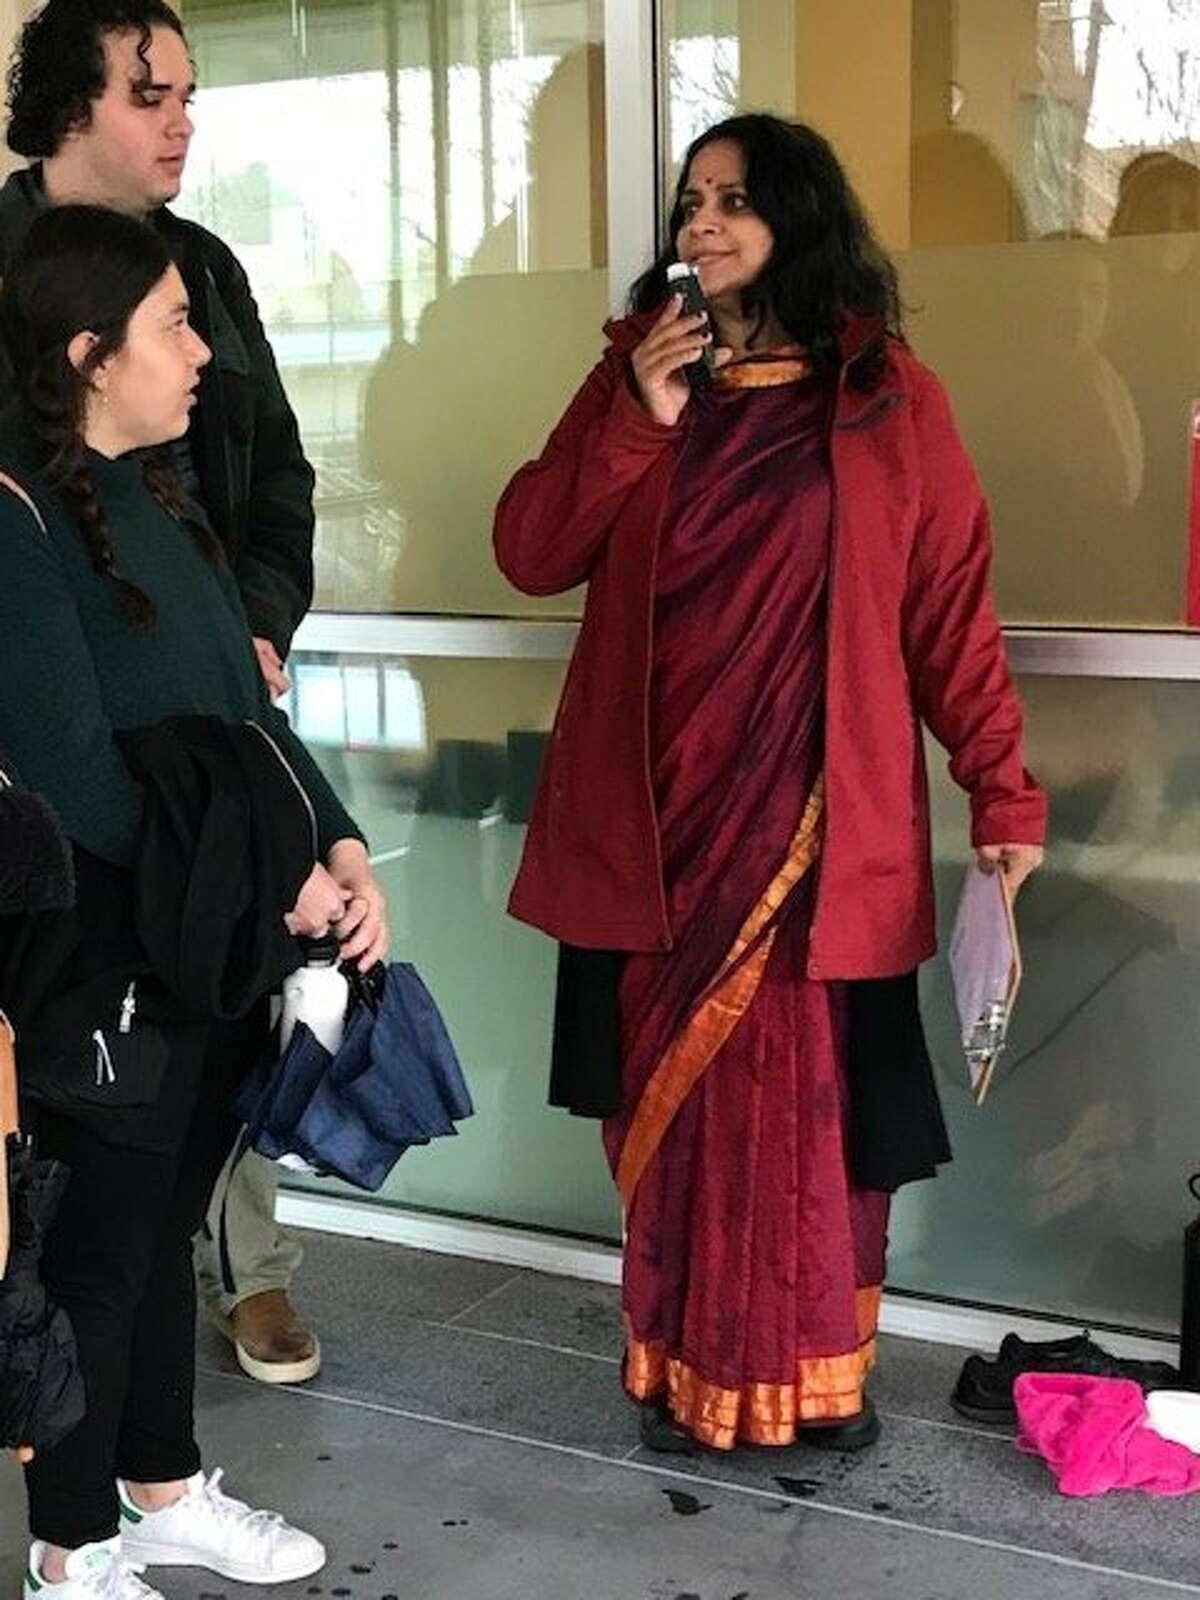 Vijaya Nagarajan, author of 'Feeding a Thousand Souls,' leads tour at USF